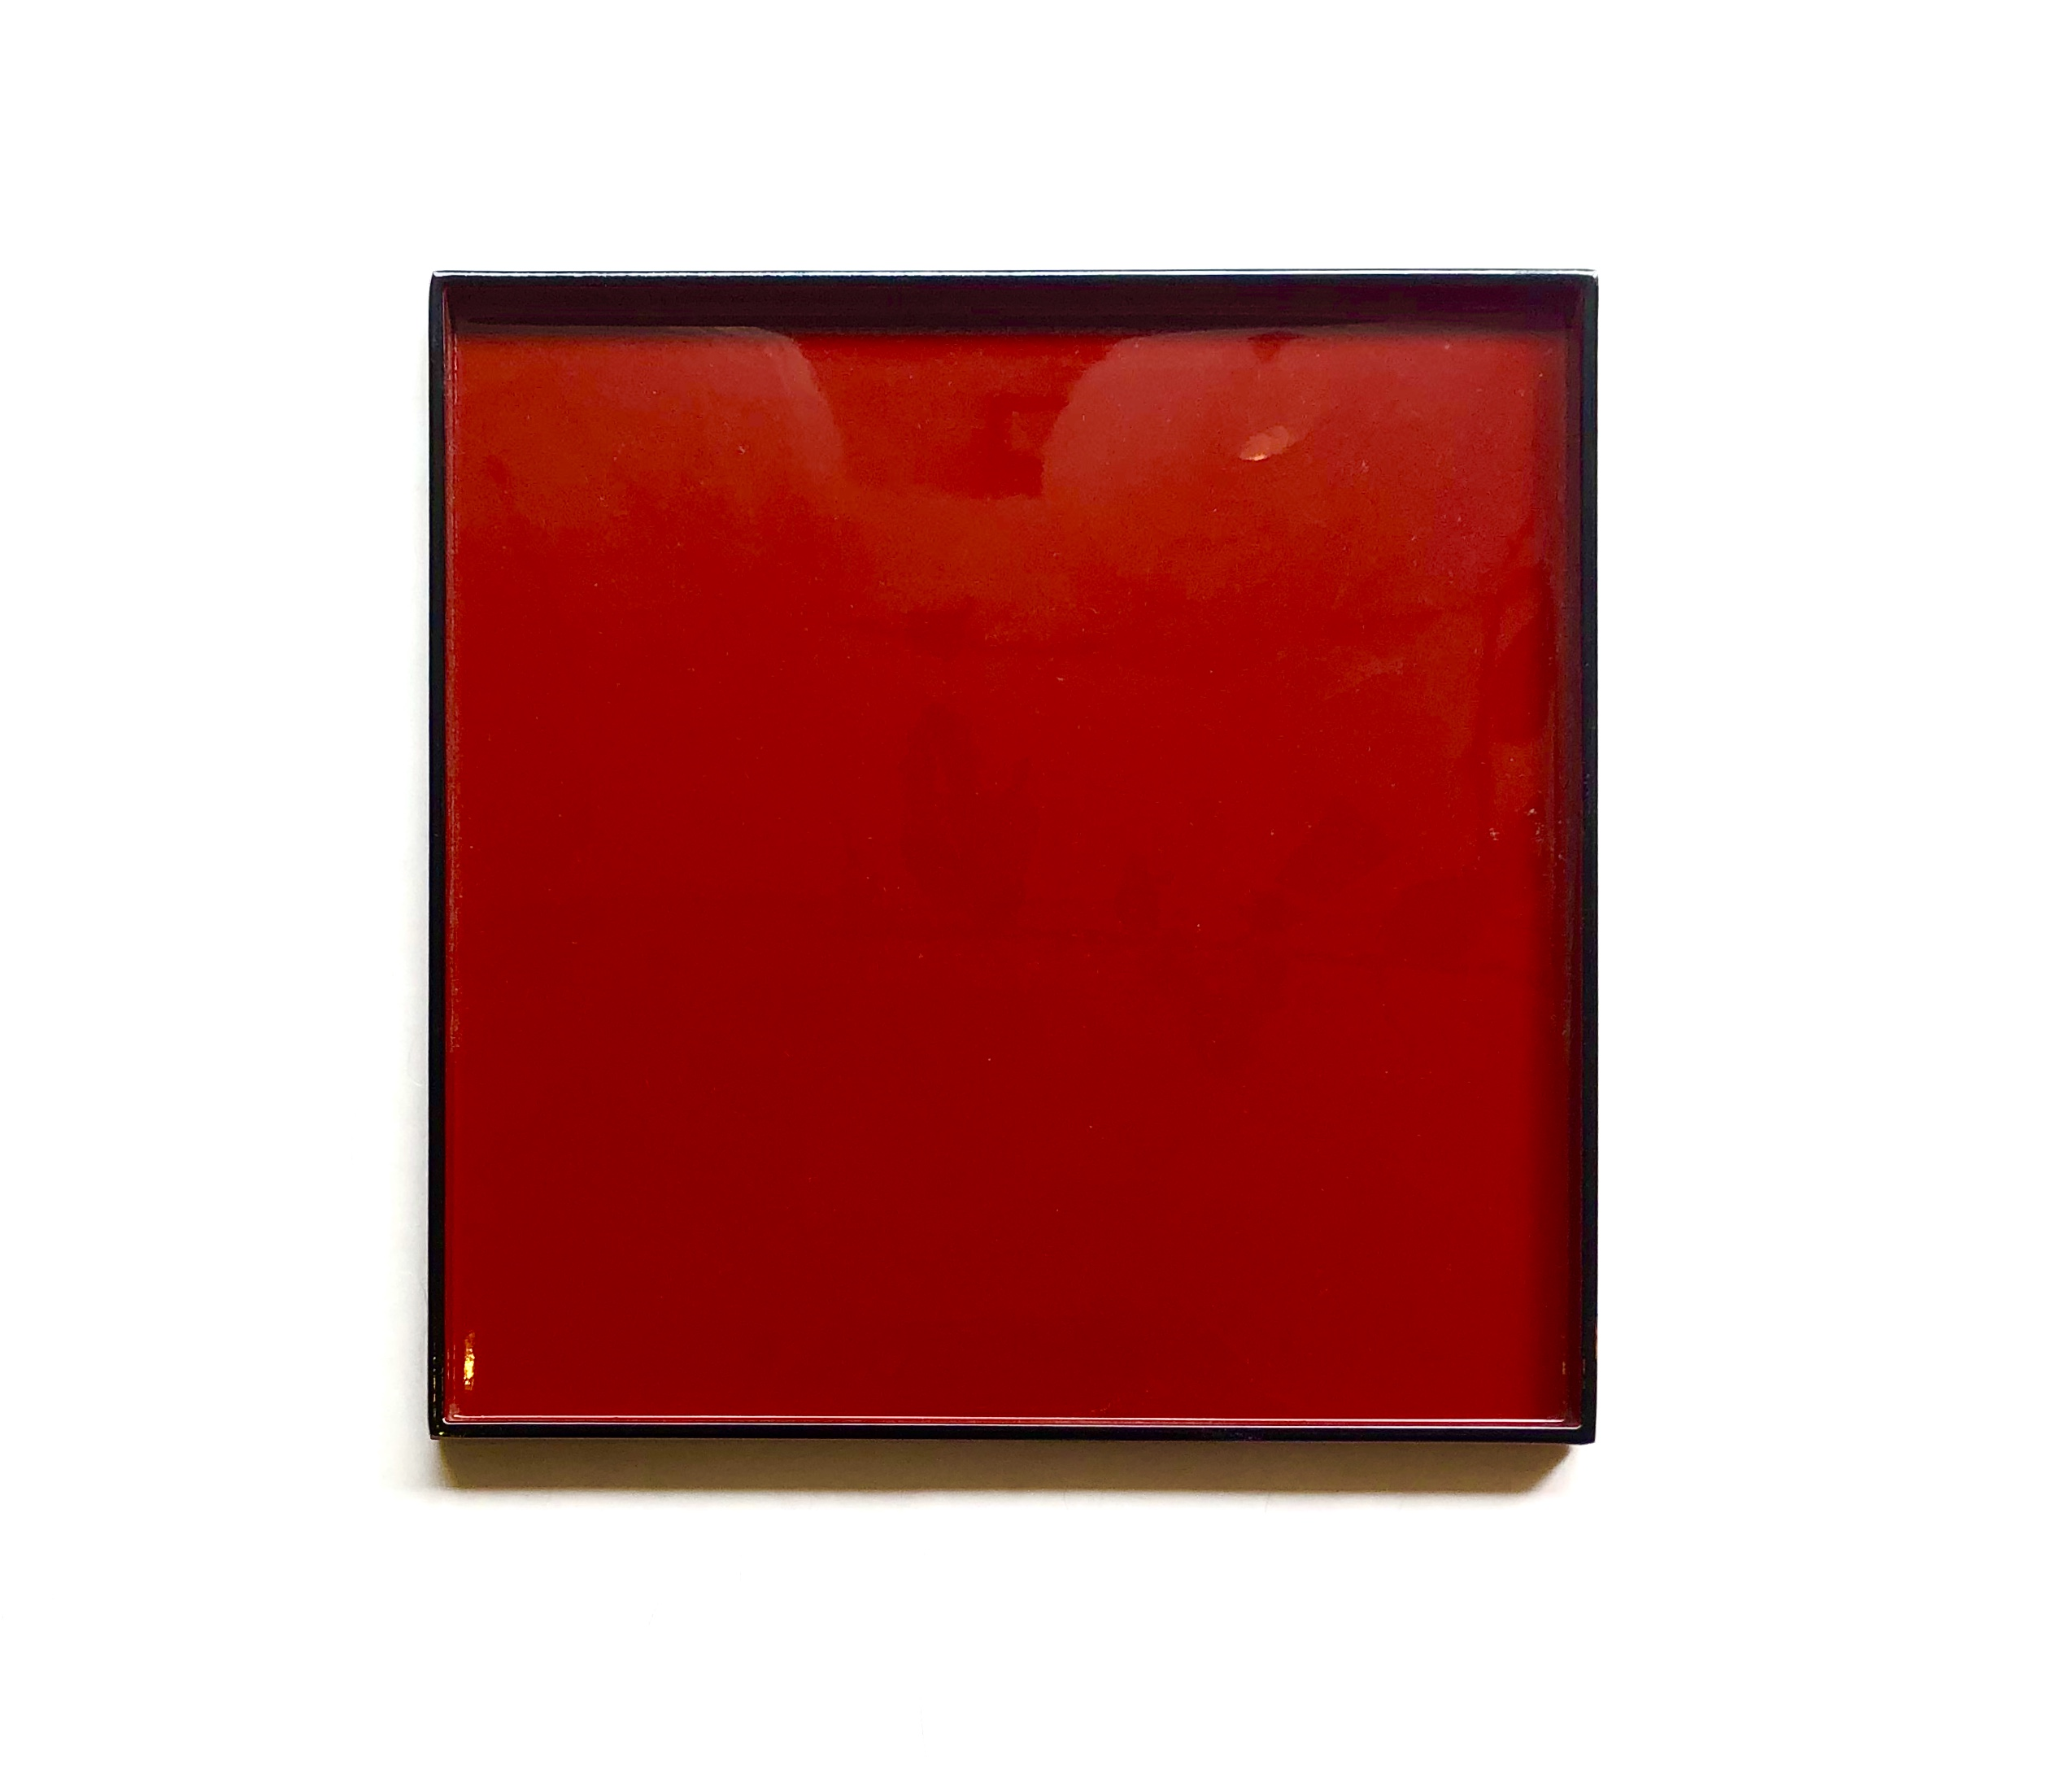 Lacktablett rot-schwarz 27 cm x 27 cm